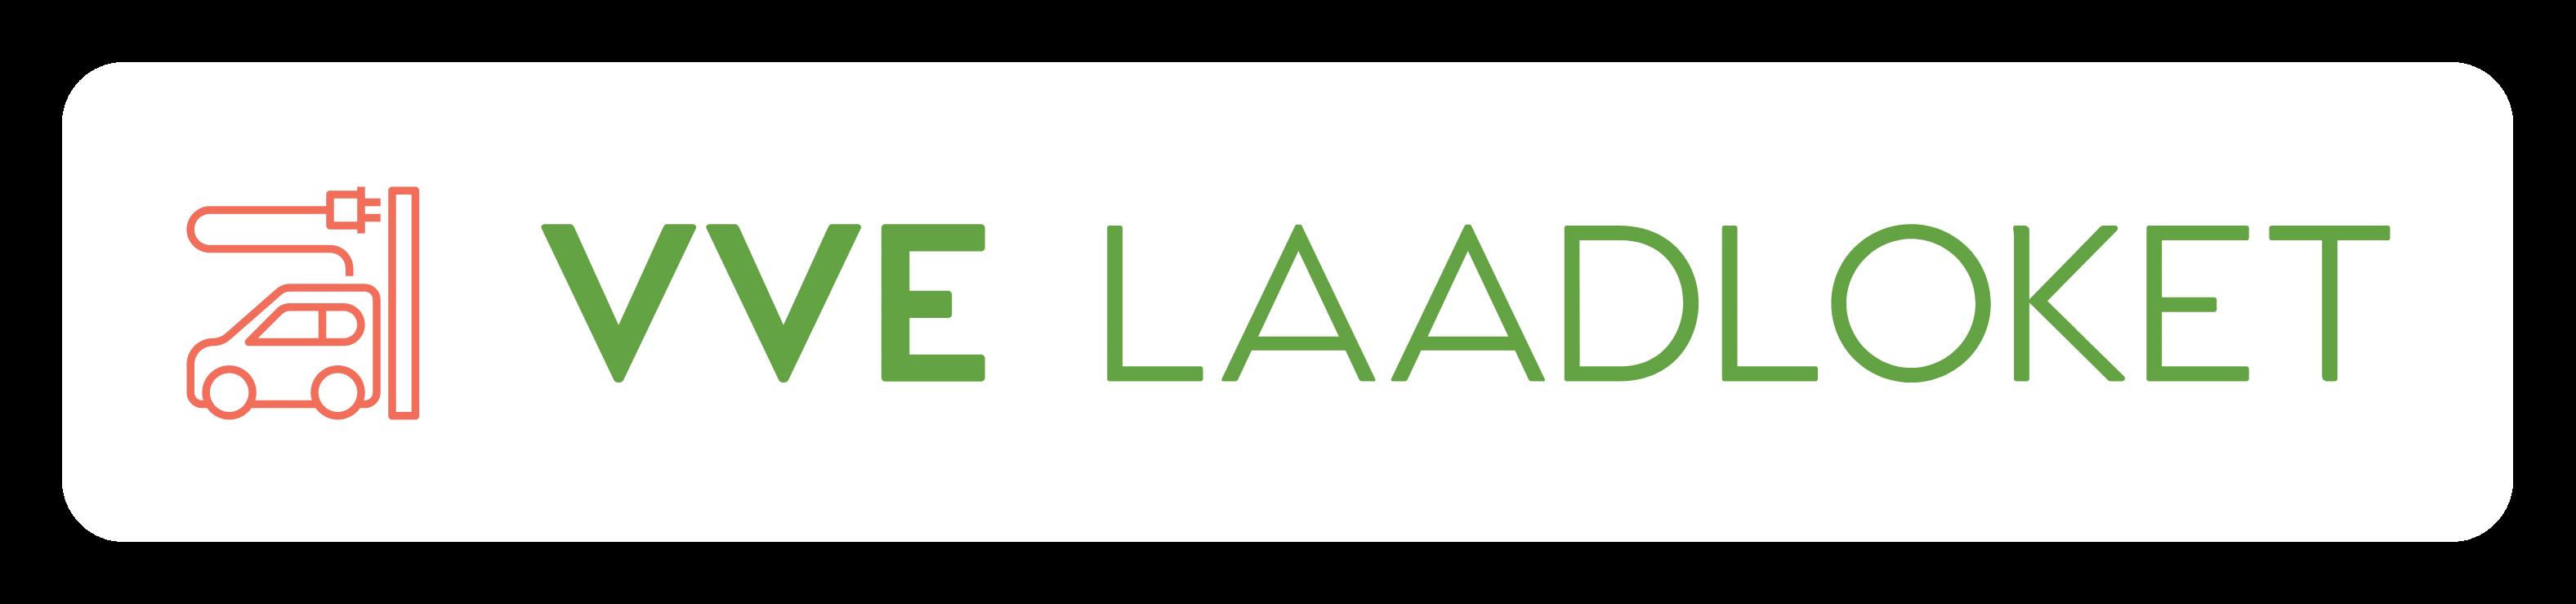 VVE Laadloket logo